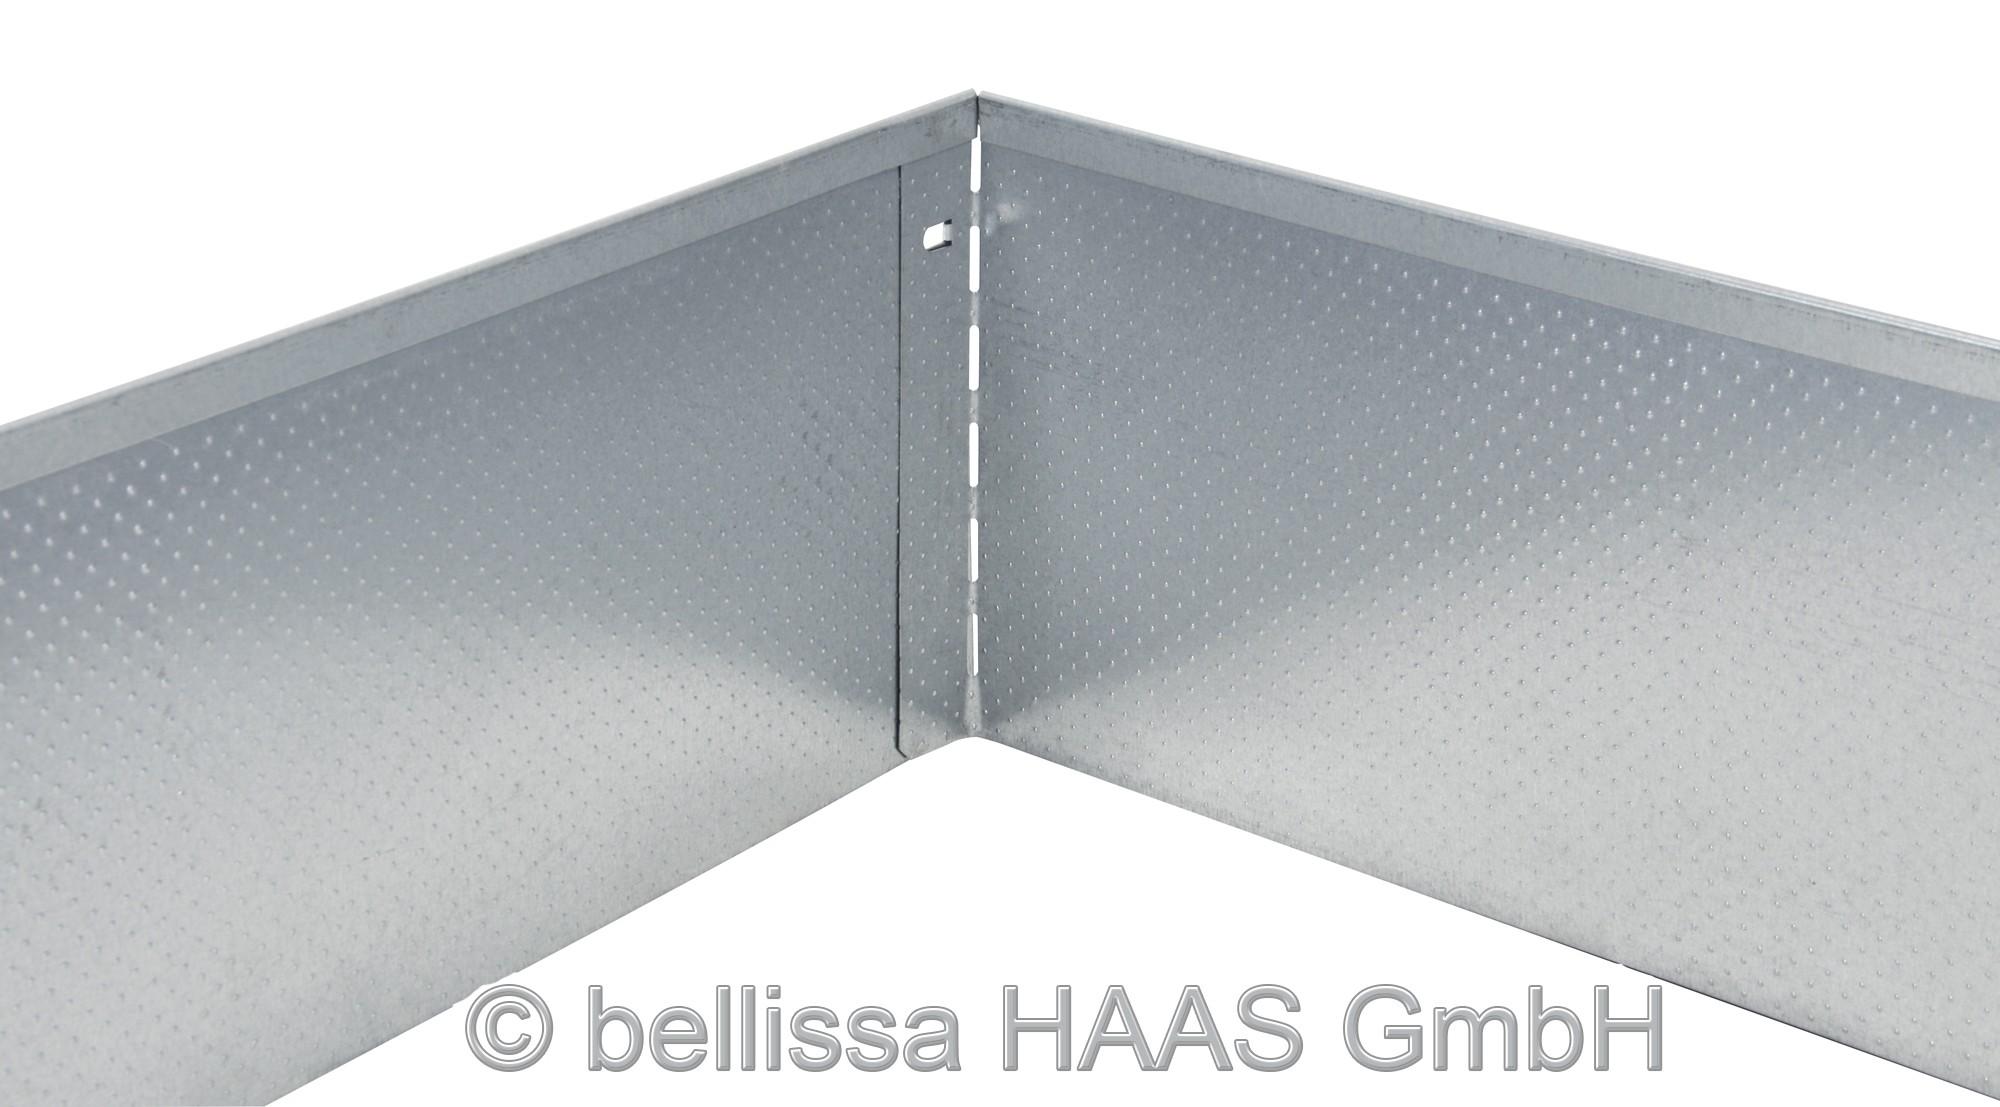 rasenkante metall verzinkt noppenstruktur bellissa. Black Bedroom Furniture Sets. Home Design Ideas